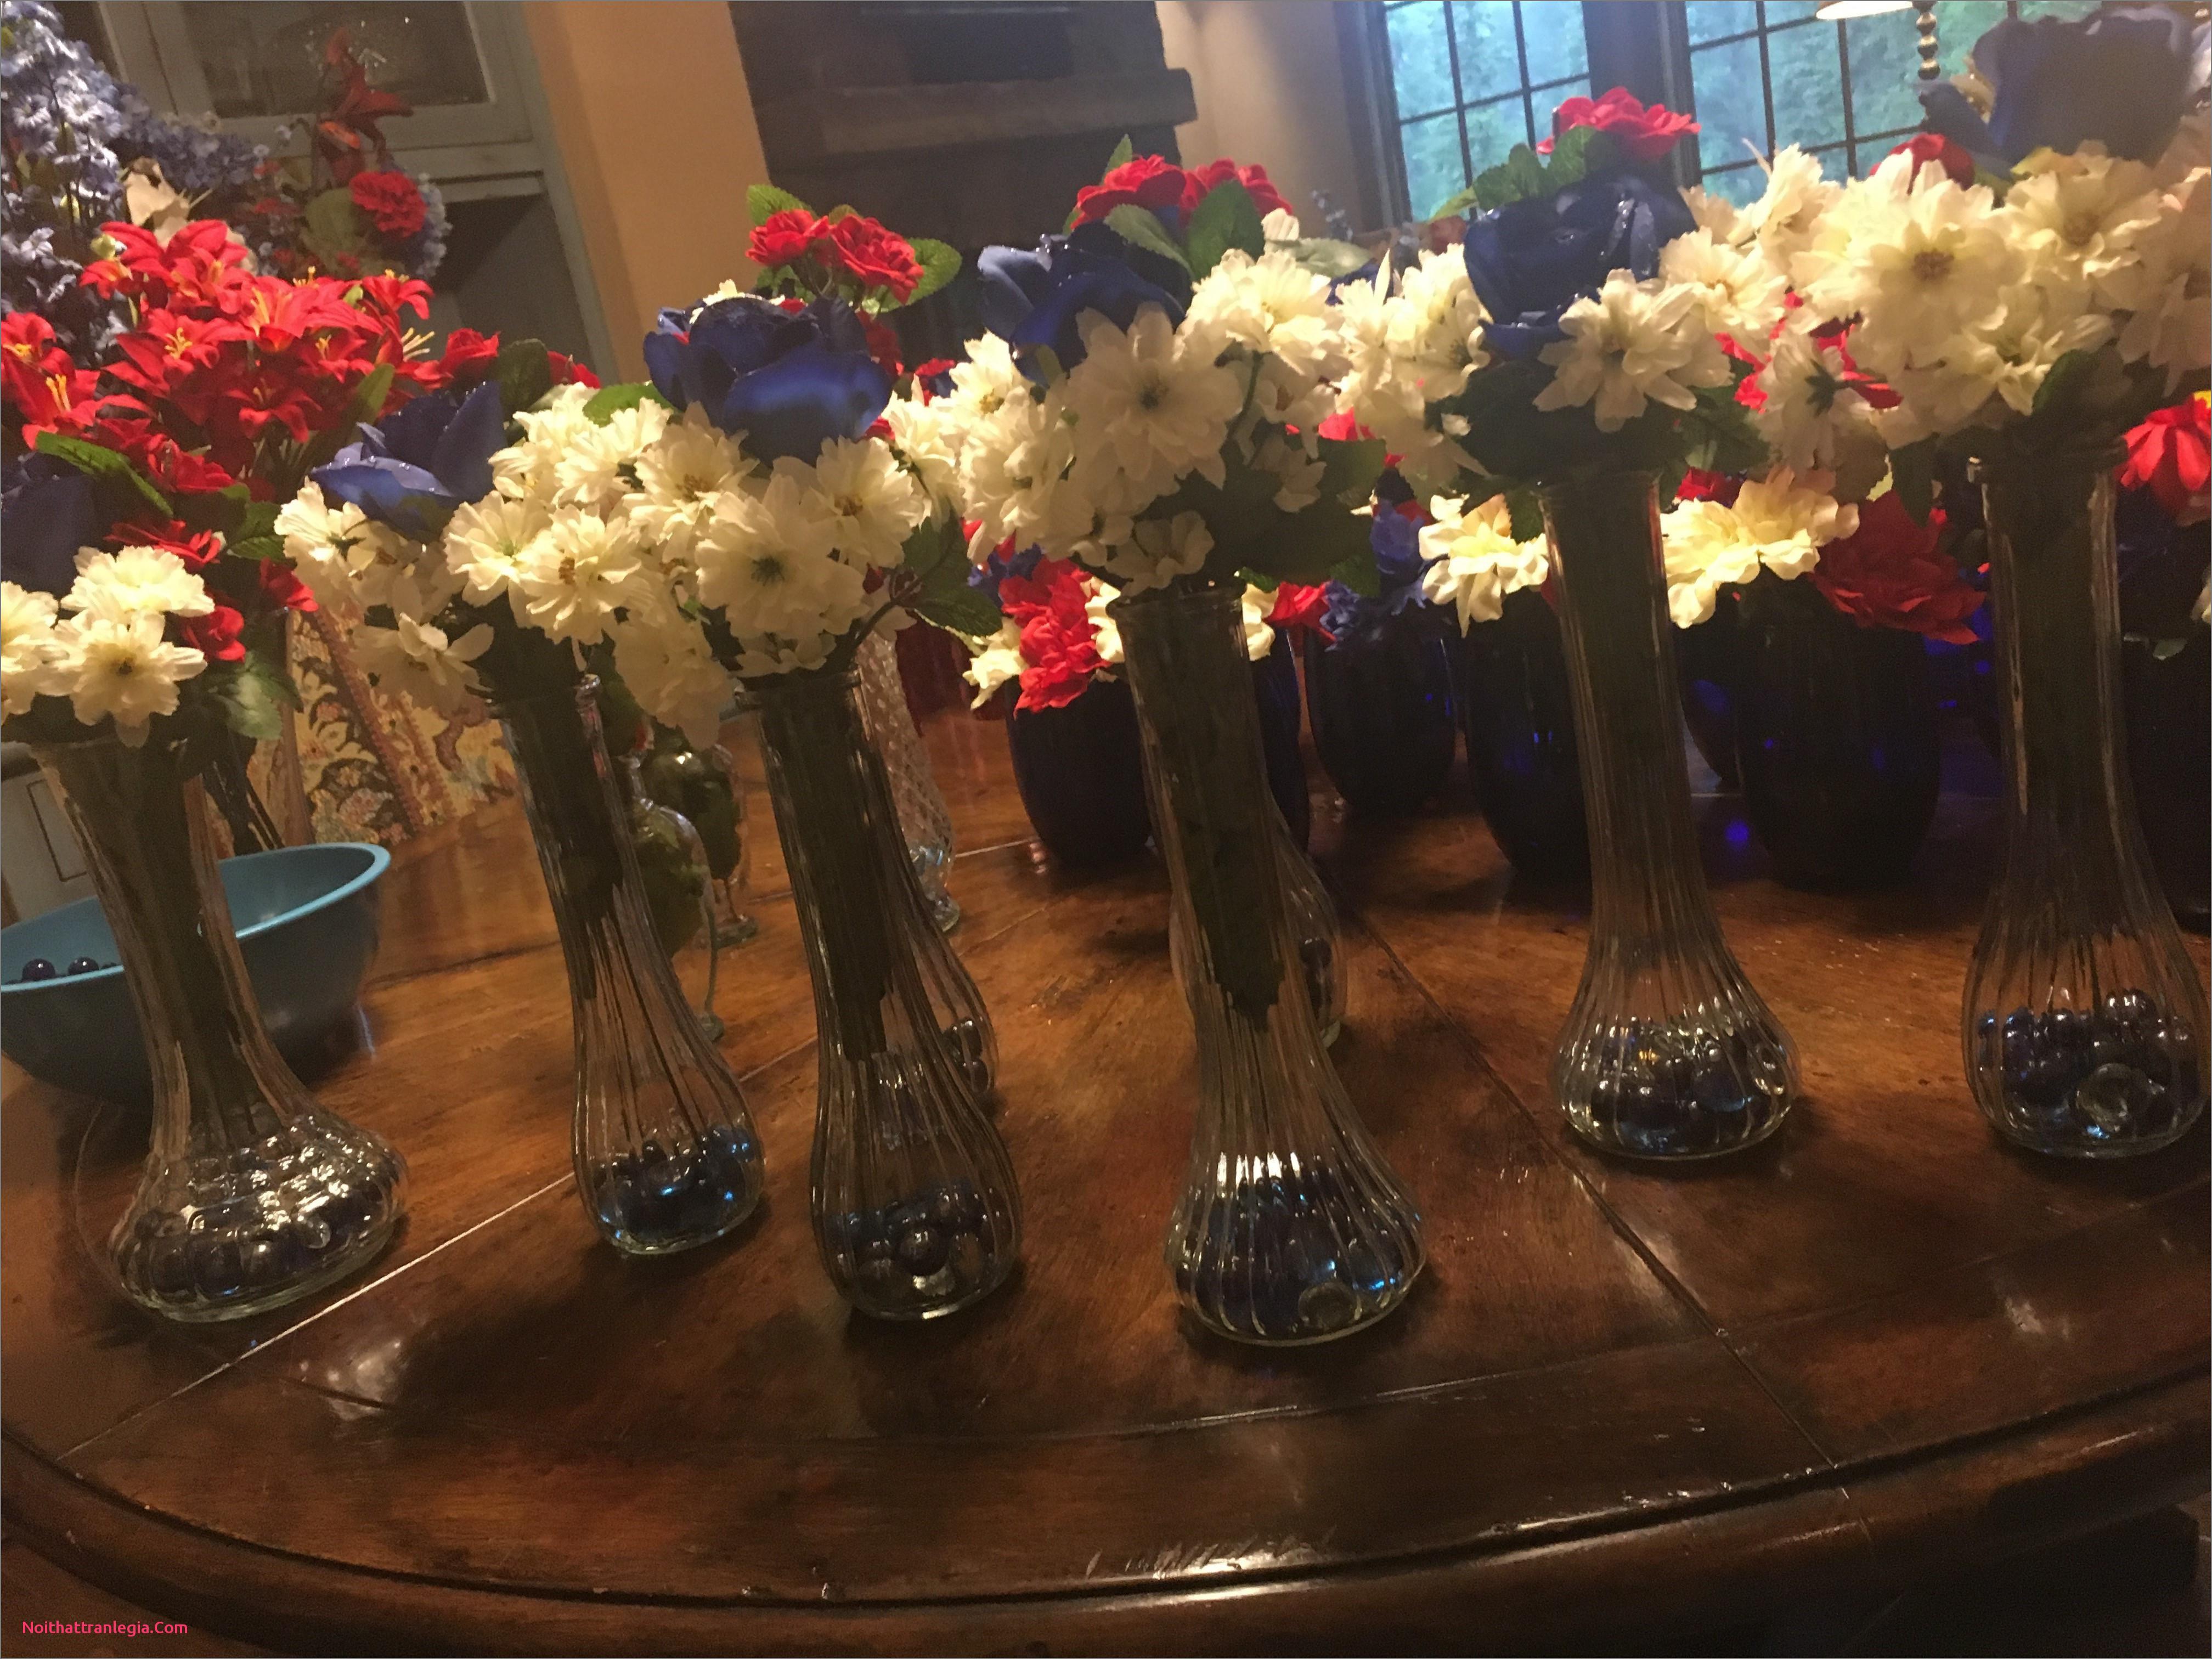 discount bud vases of 20 wedding vases noithattranlegia vases design for decoration line luxury dollar tree wedding decorations awesome h vases dollar vase i 0d